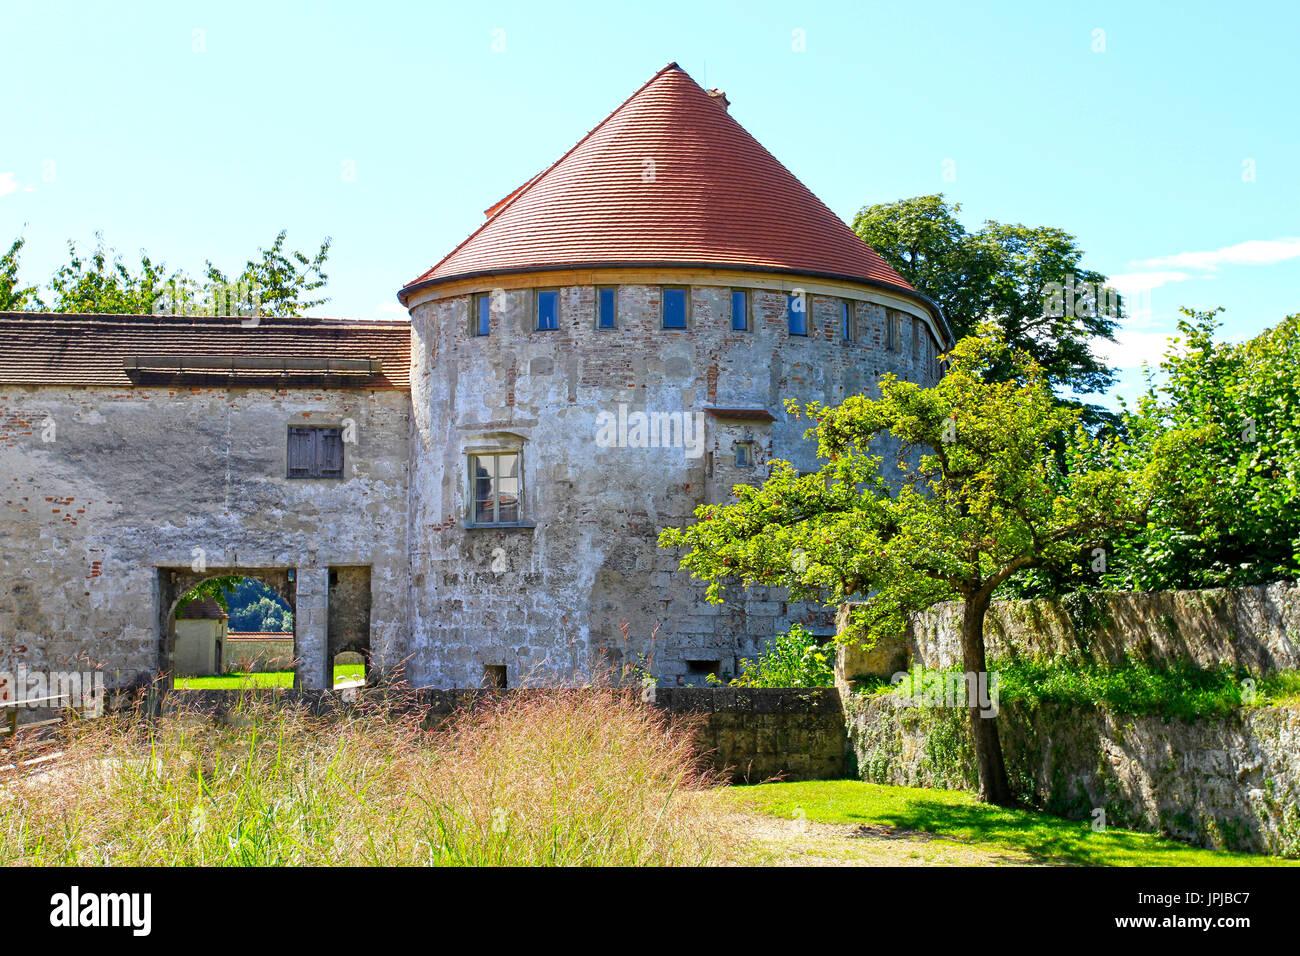 Part of the castle complex, Burg zu Burghausen Castle, Burghausen, Upper Bavaria, Bavaria, Germany, Europe - Stock Image